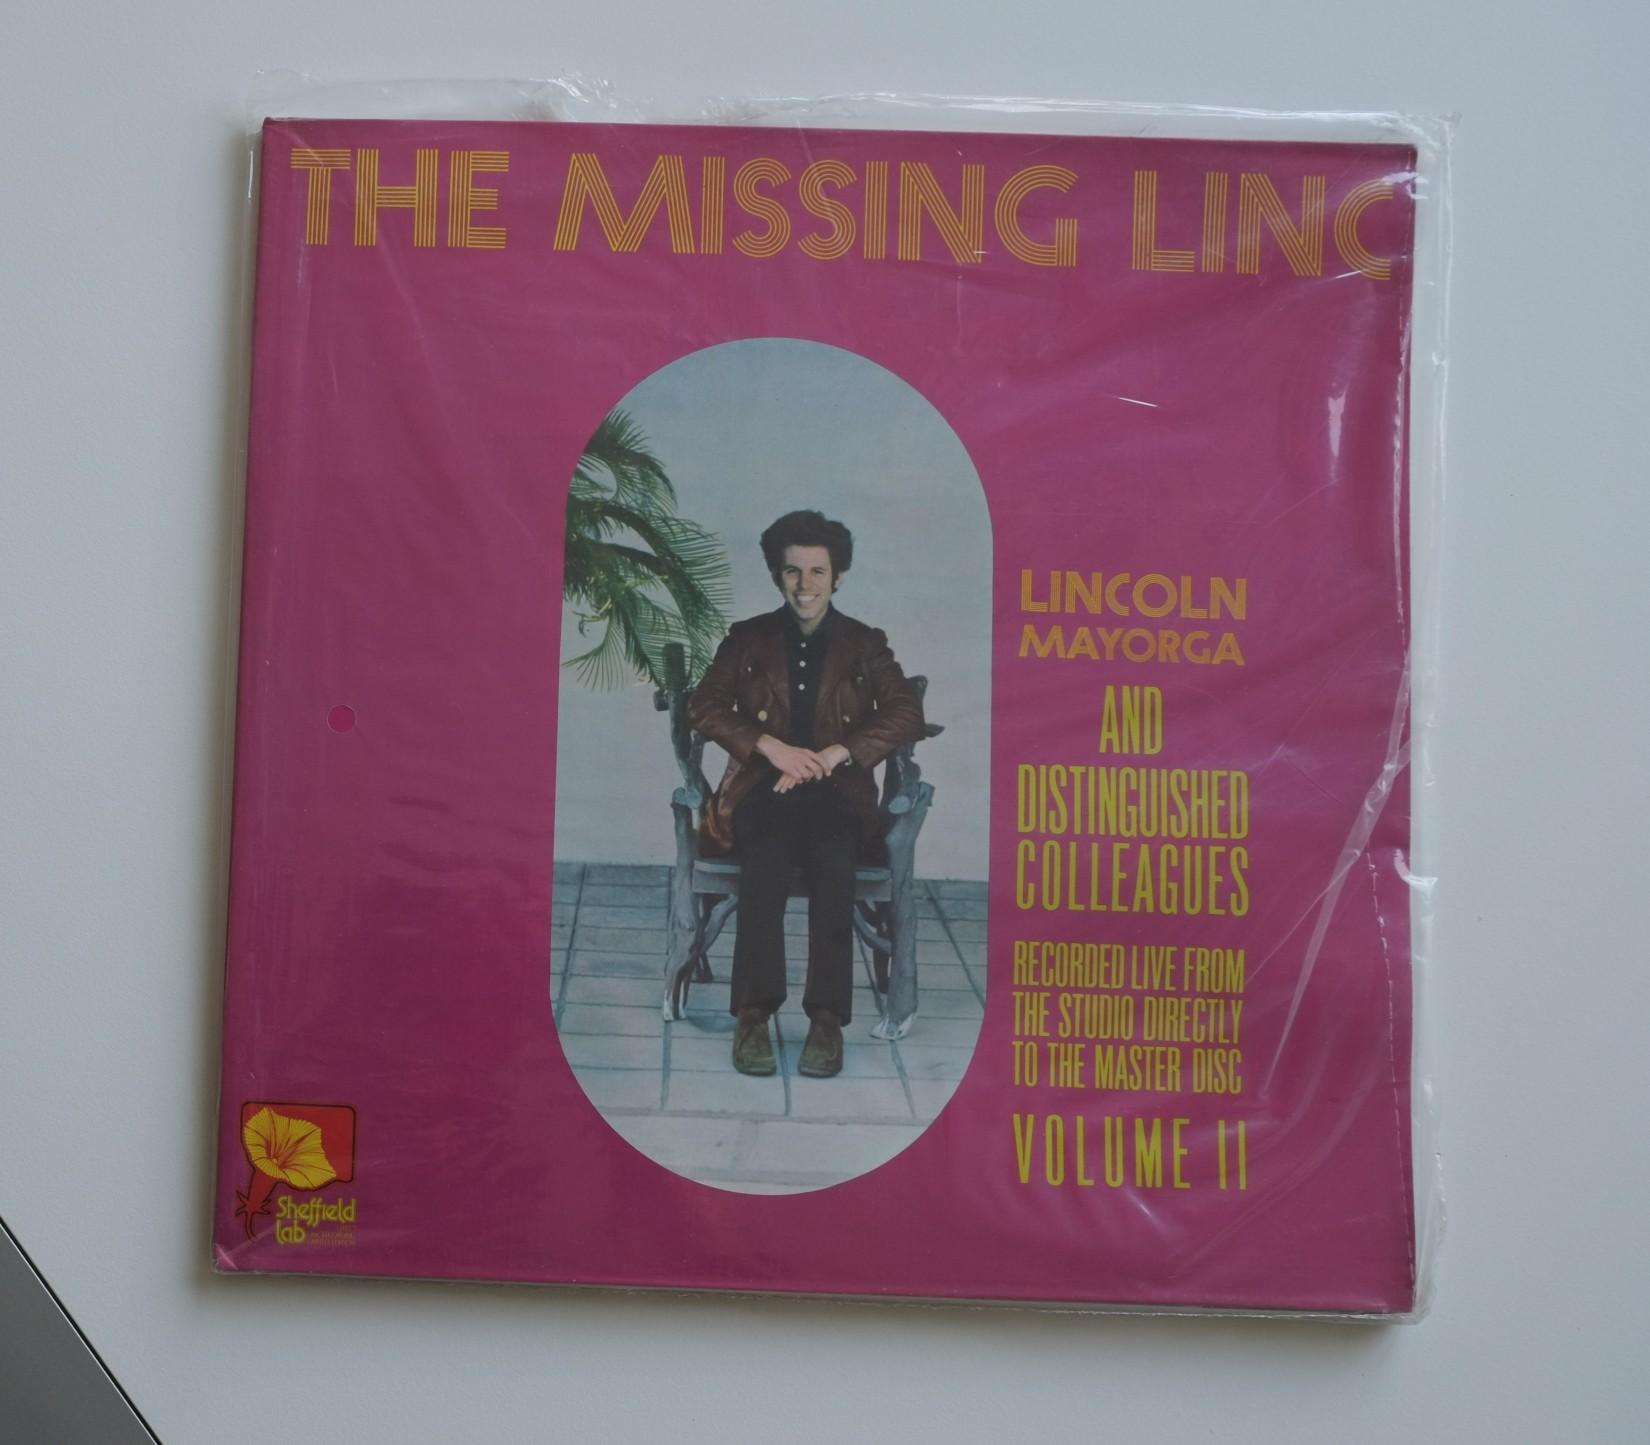 LP-Lincoln Mayorga - The Missing Linc-1